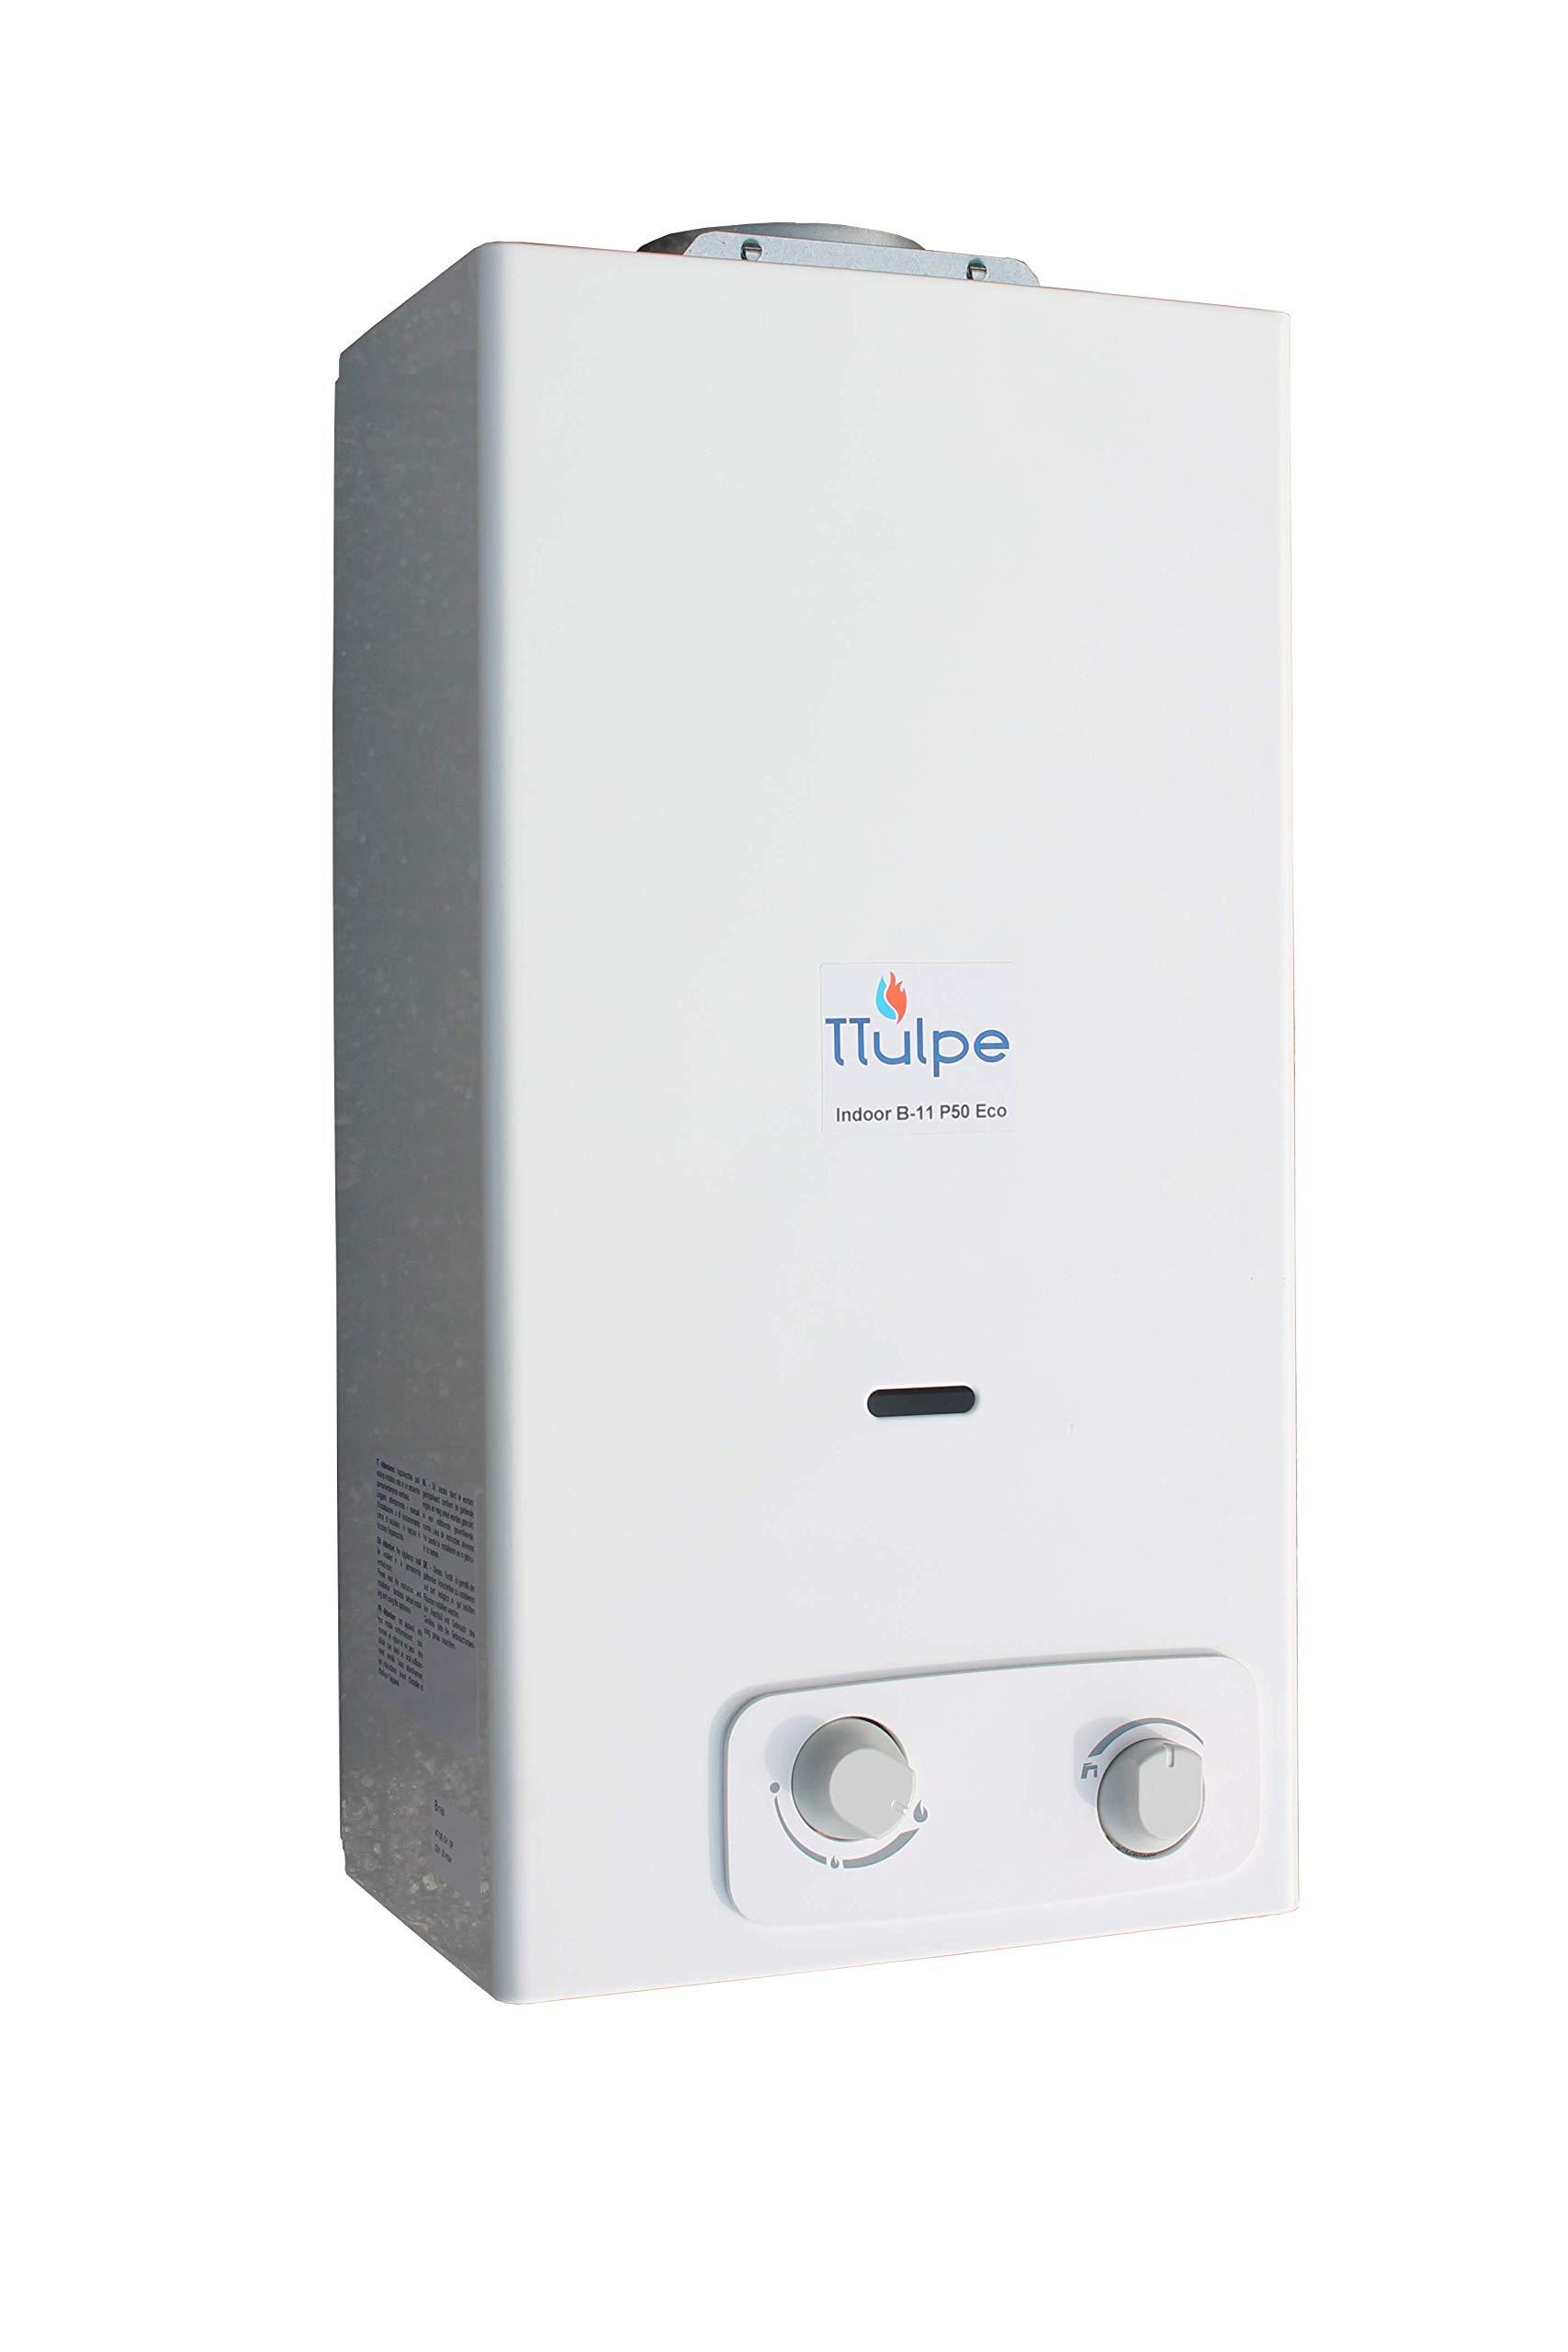 TTulpe Propangas-Durchlauferhitzer TTIB1137 Indoor B11 P37 Eco 1.5V Blanco calentador a gas propano, 1.5 V